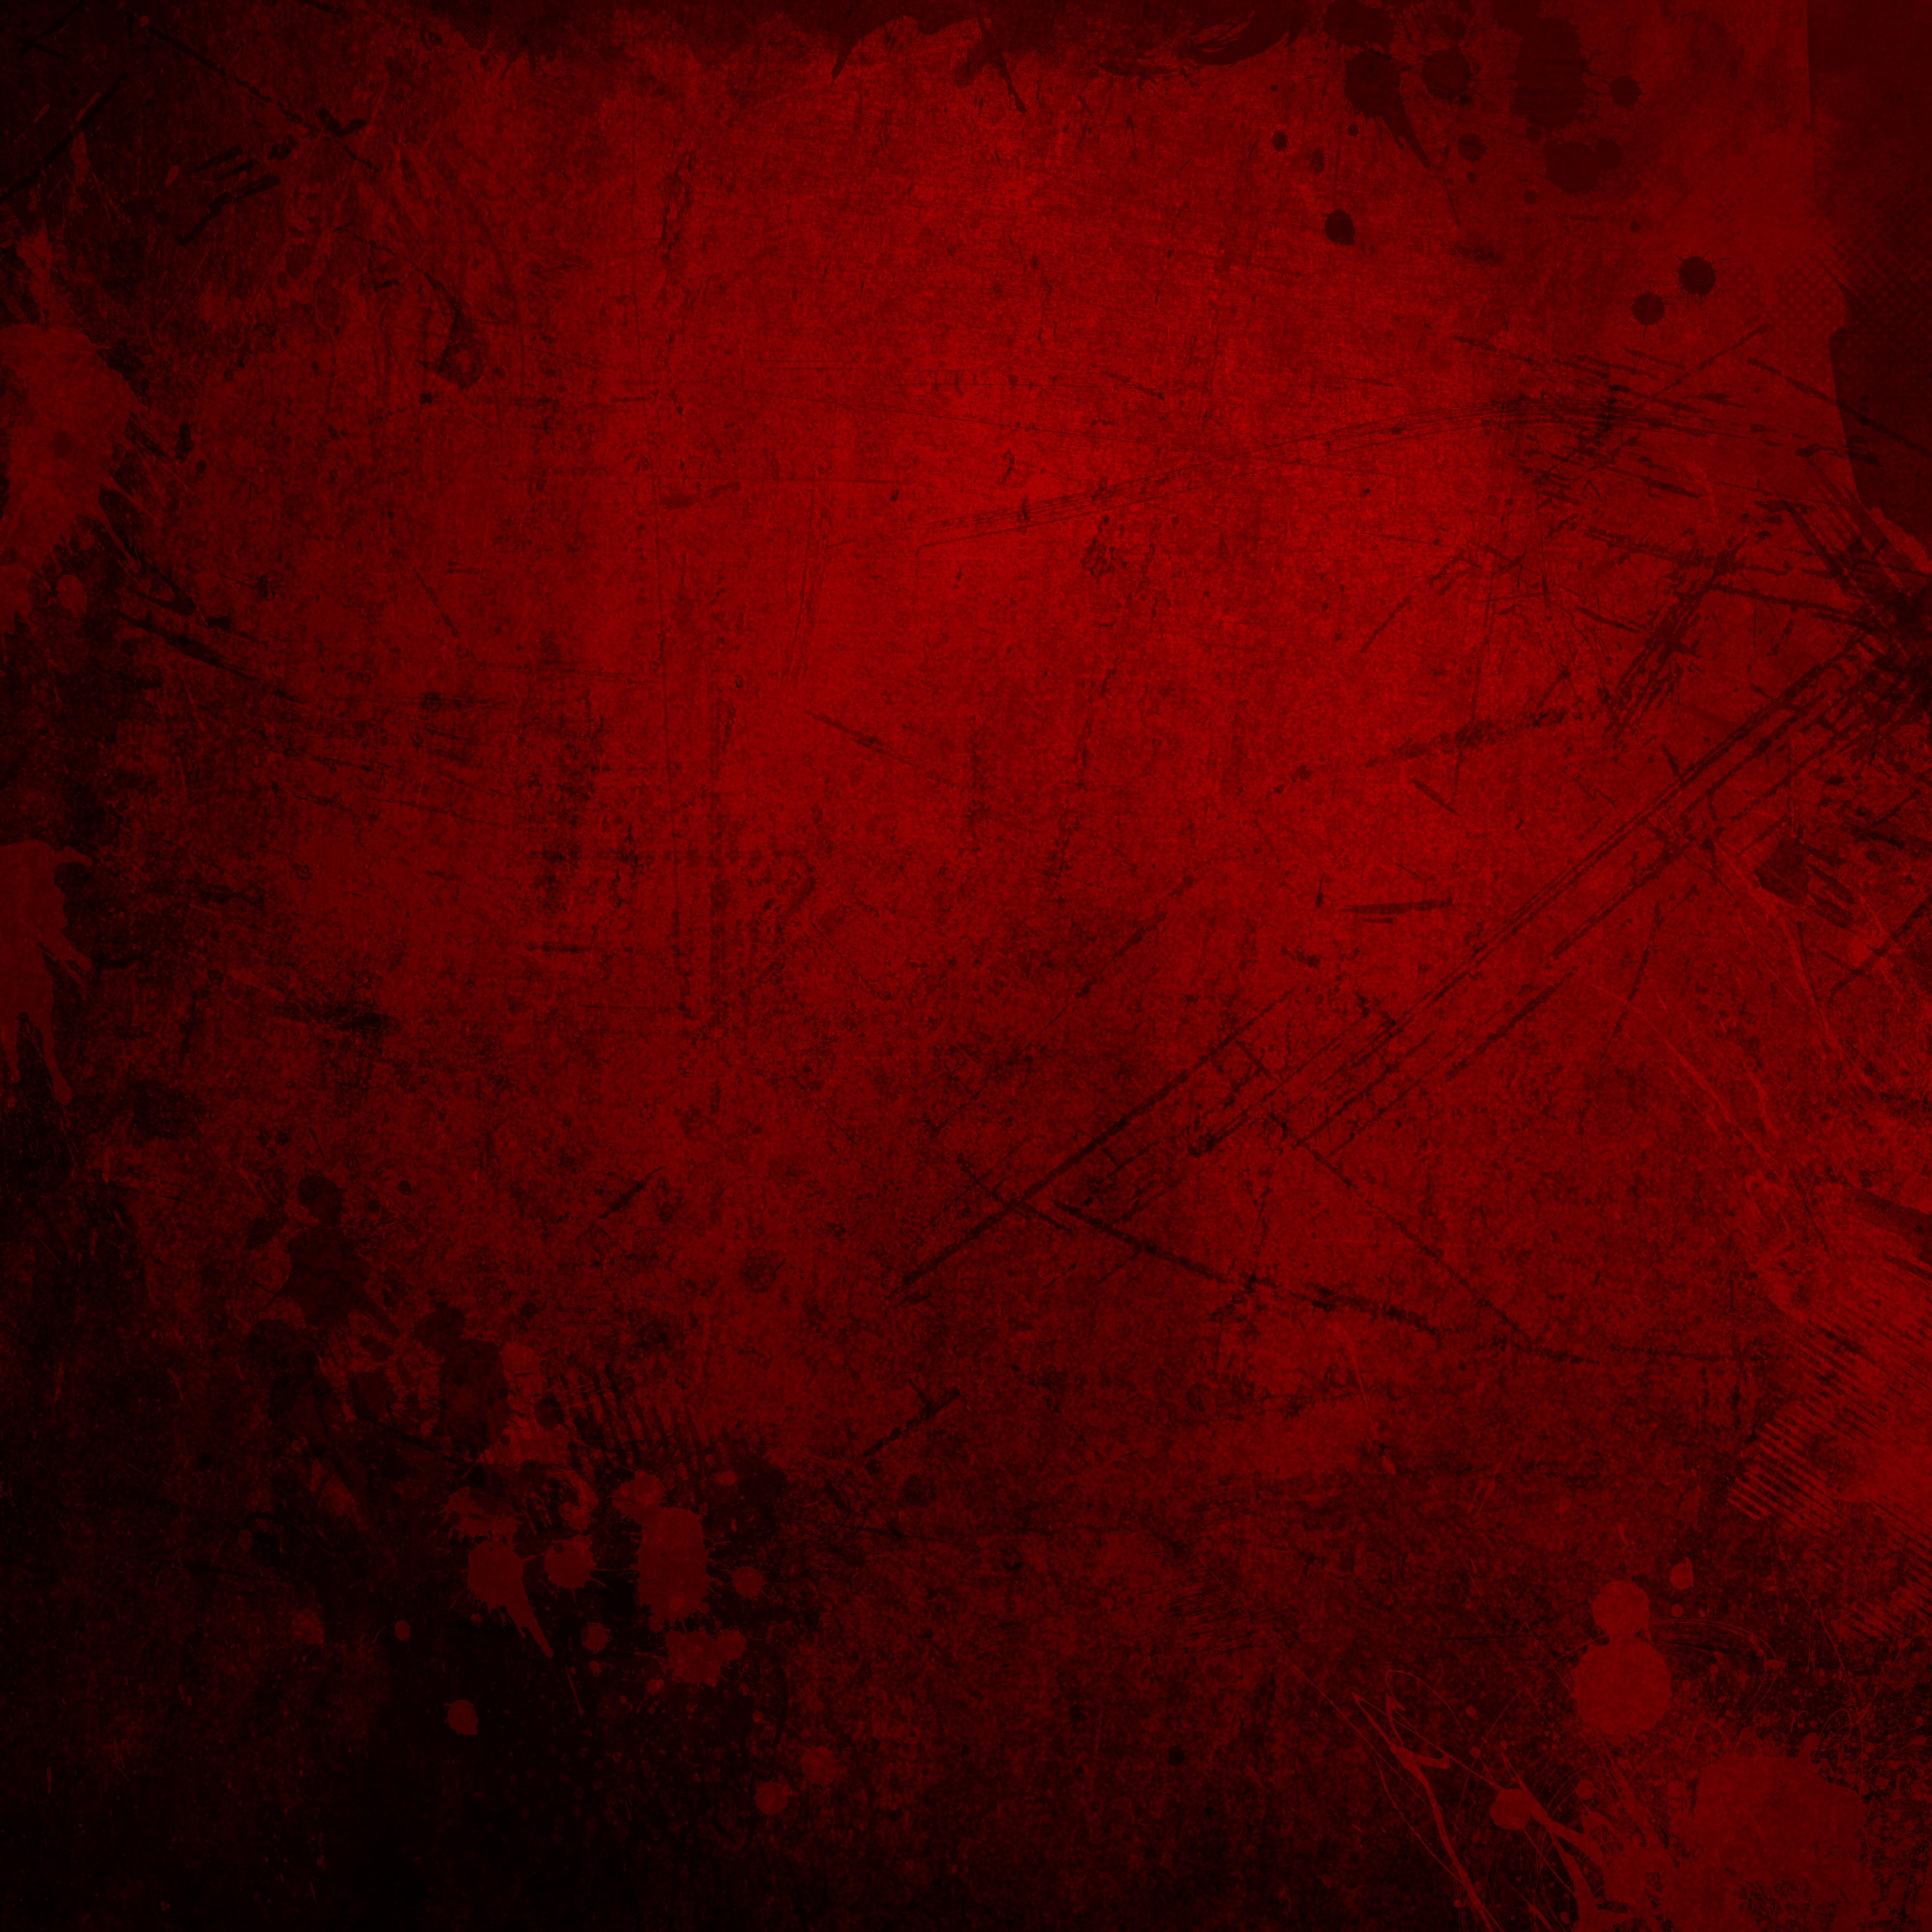 Free Download Grunge Red Background Red Grunge Background